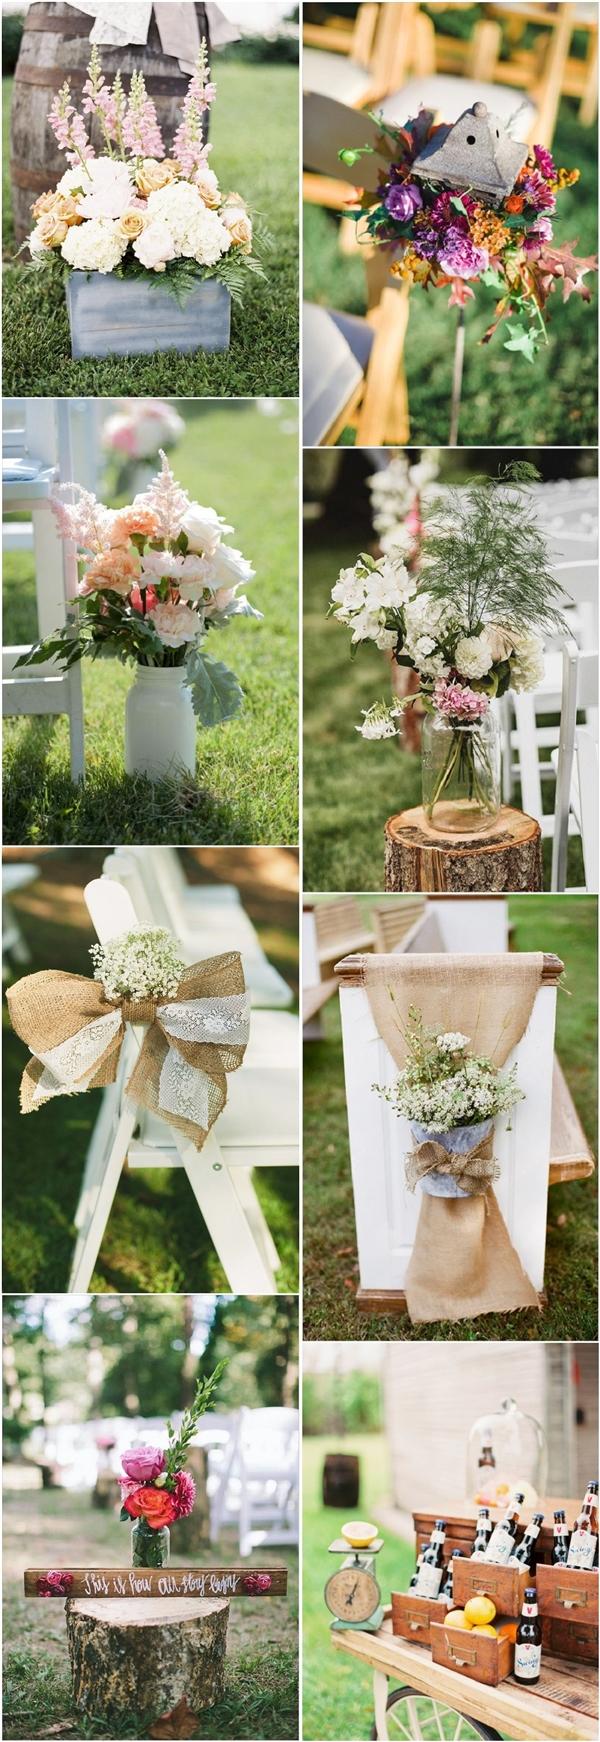 30 Rustic Backyard Outdoor Garden Wedding Ideas Deer Pearl Flowers